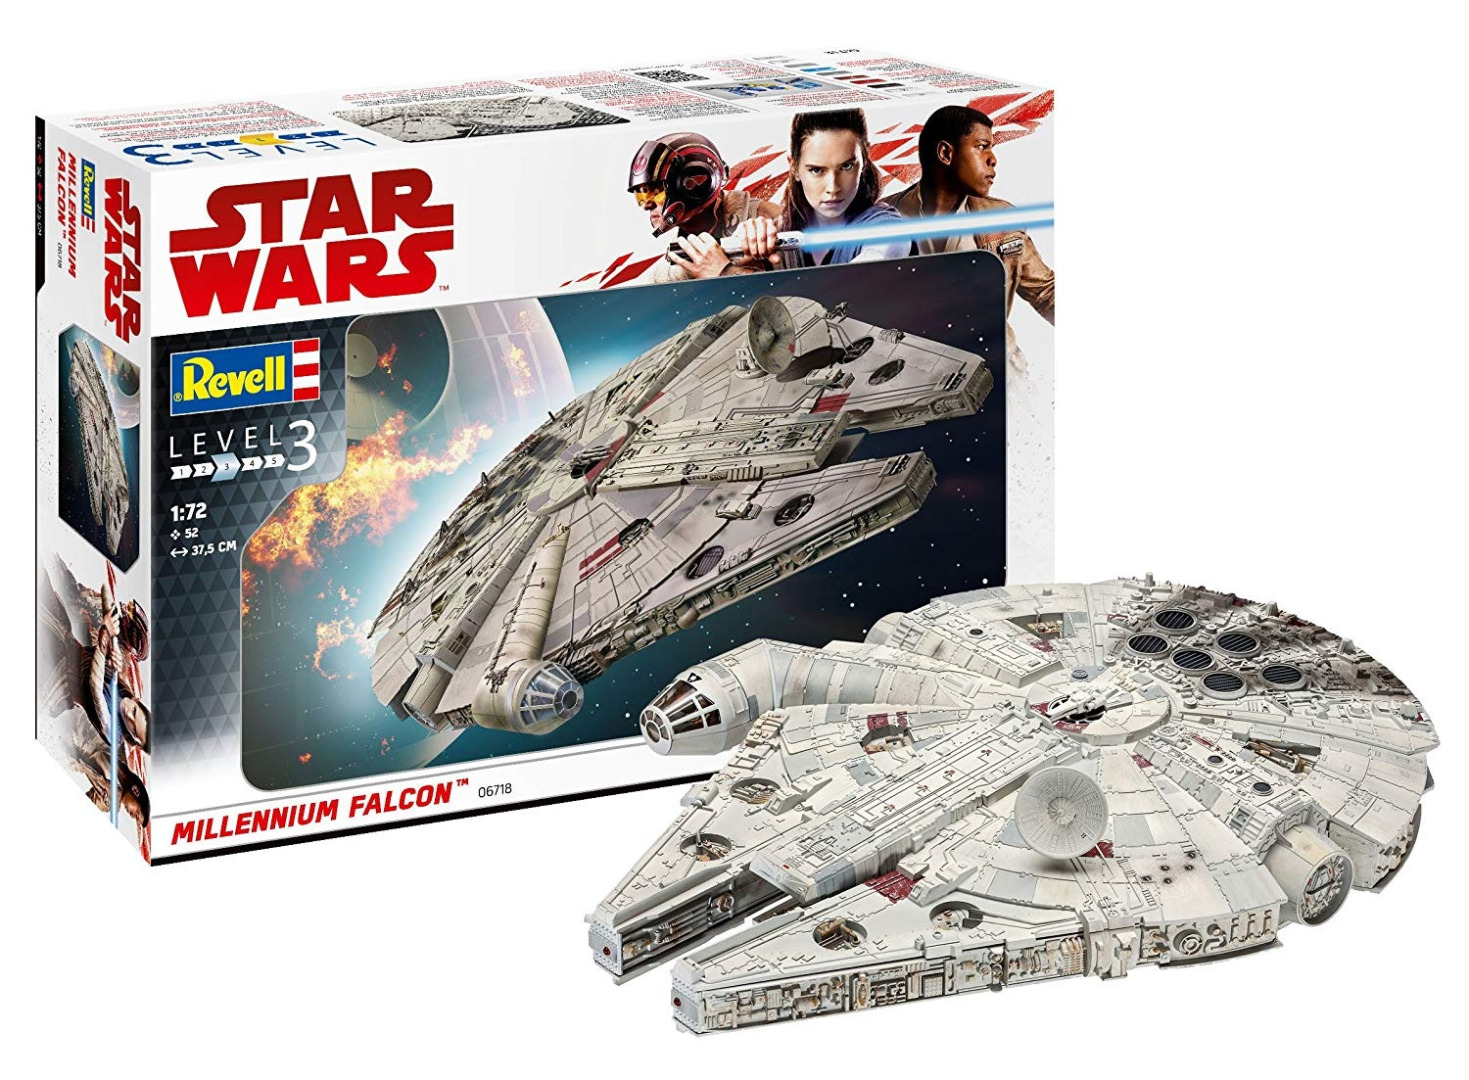 Revell Model Kit Star Wars Millennium Falcon Scale 1:72